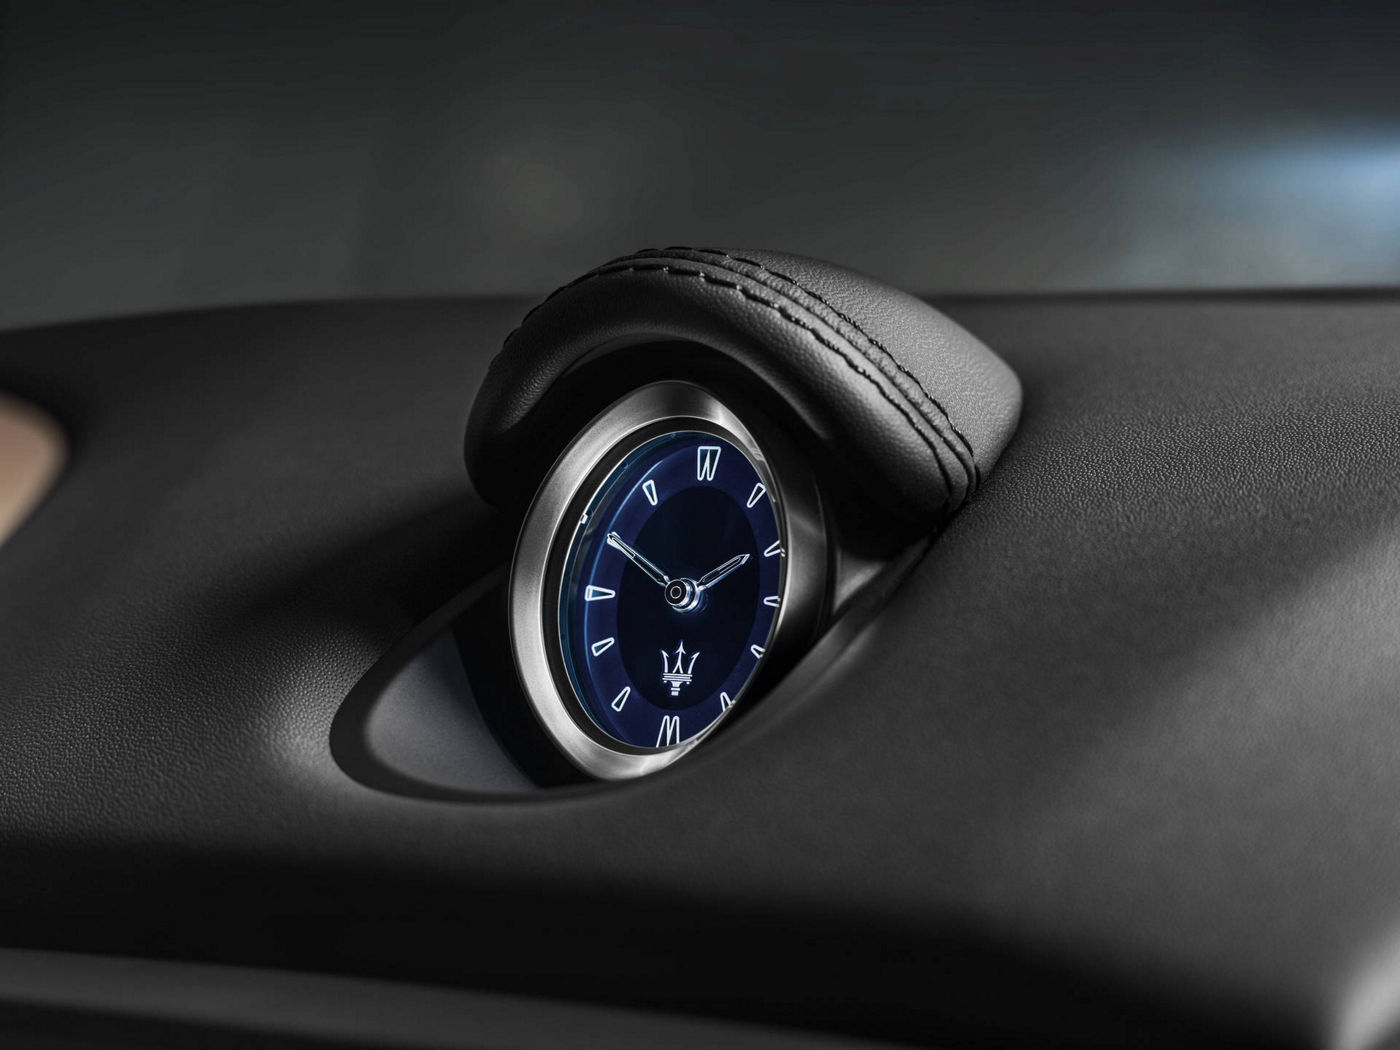 Maserati Ghibli GranLusso blue internal clock detail